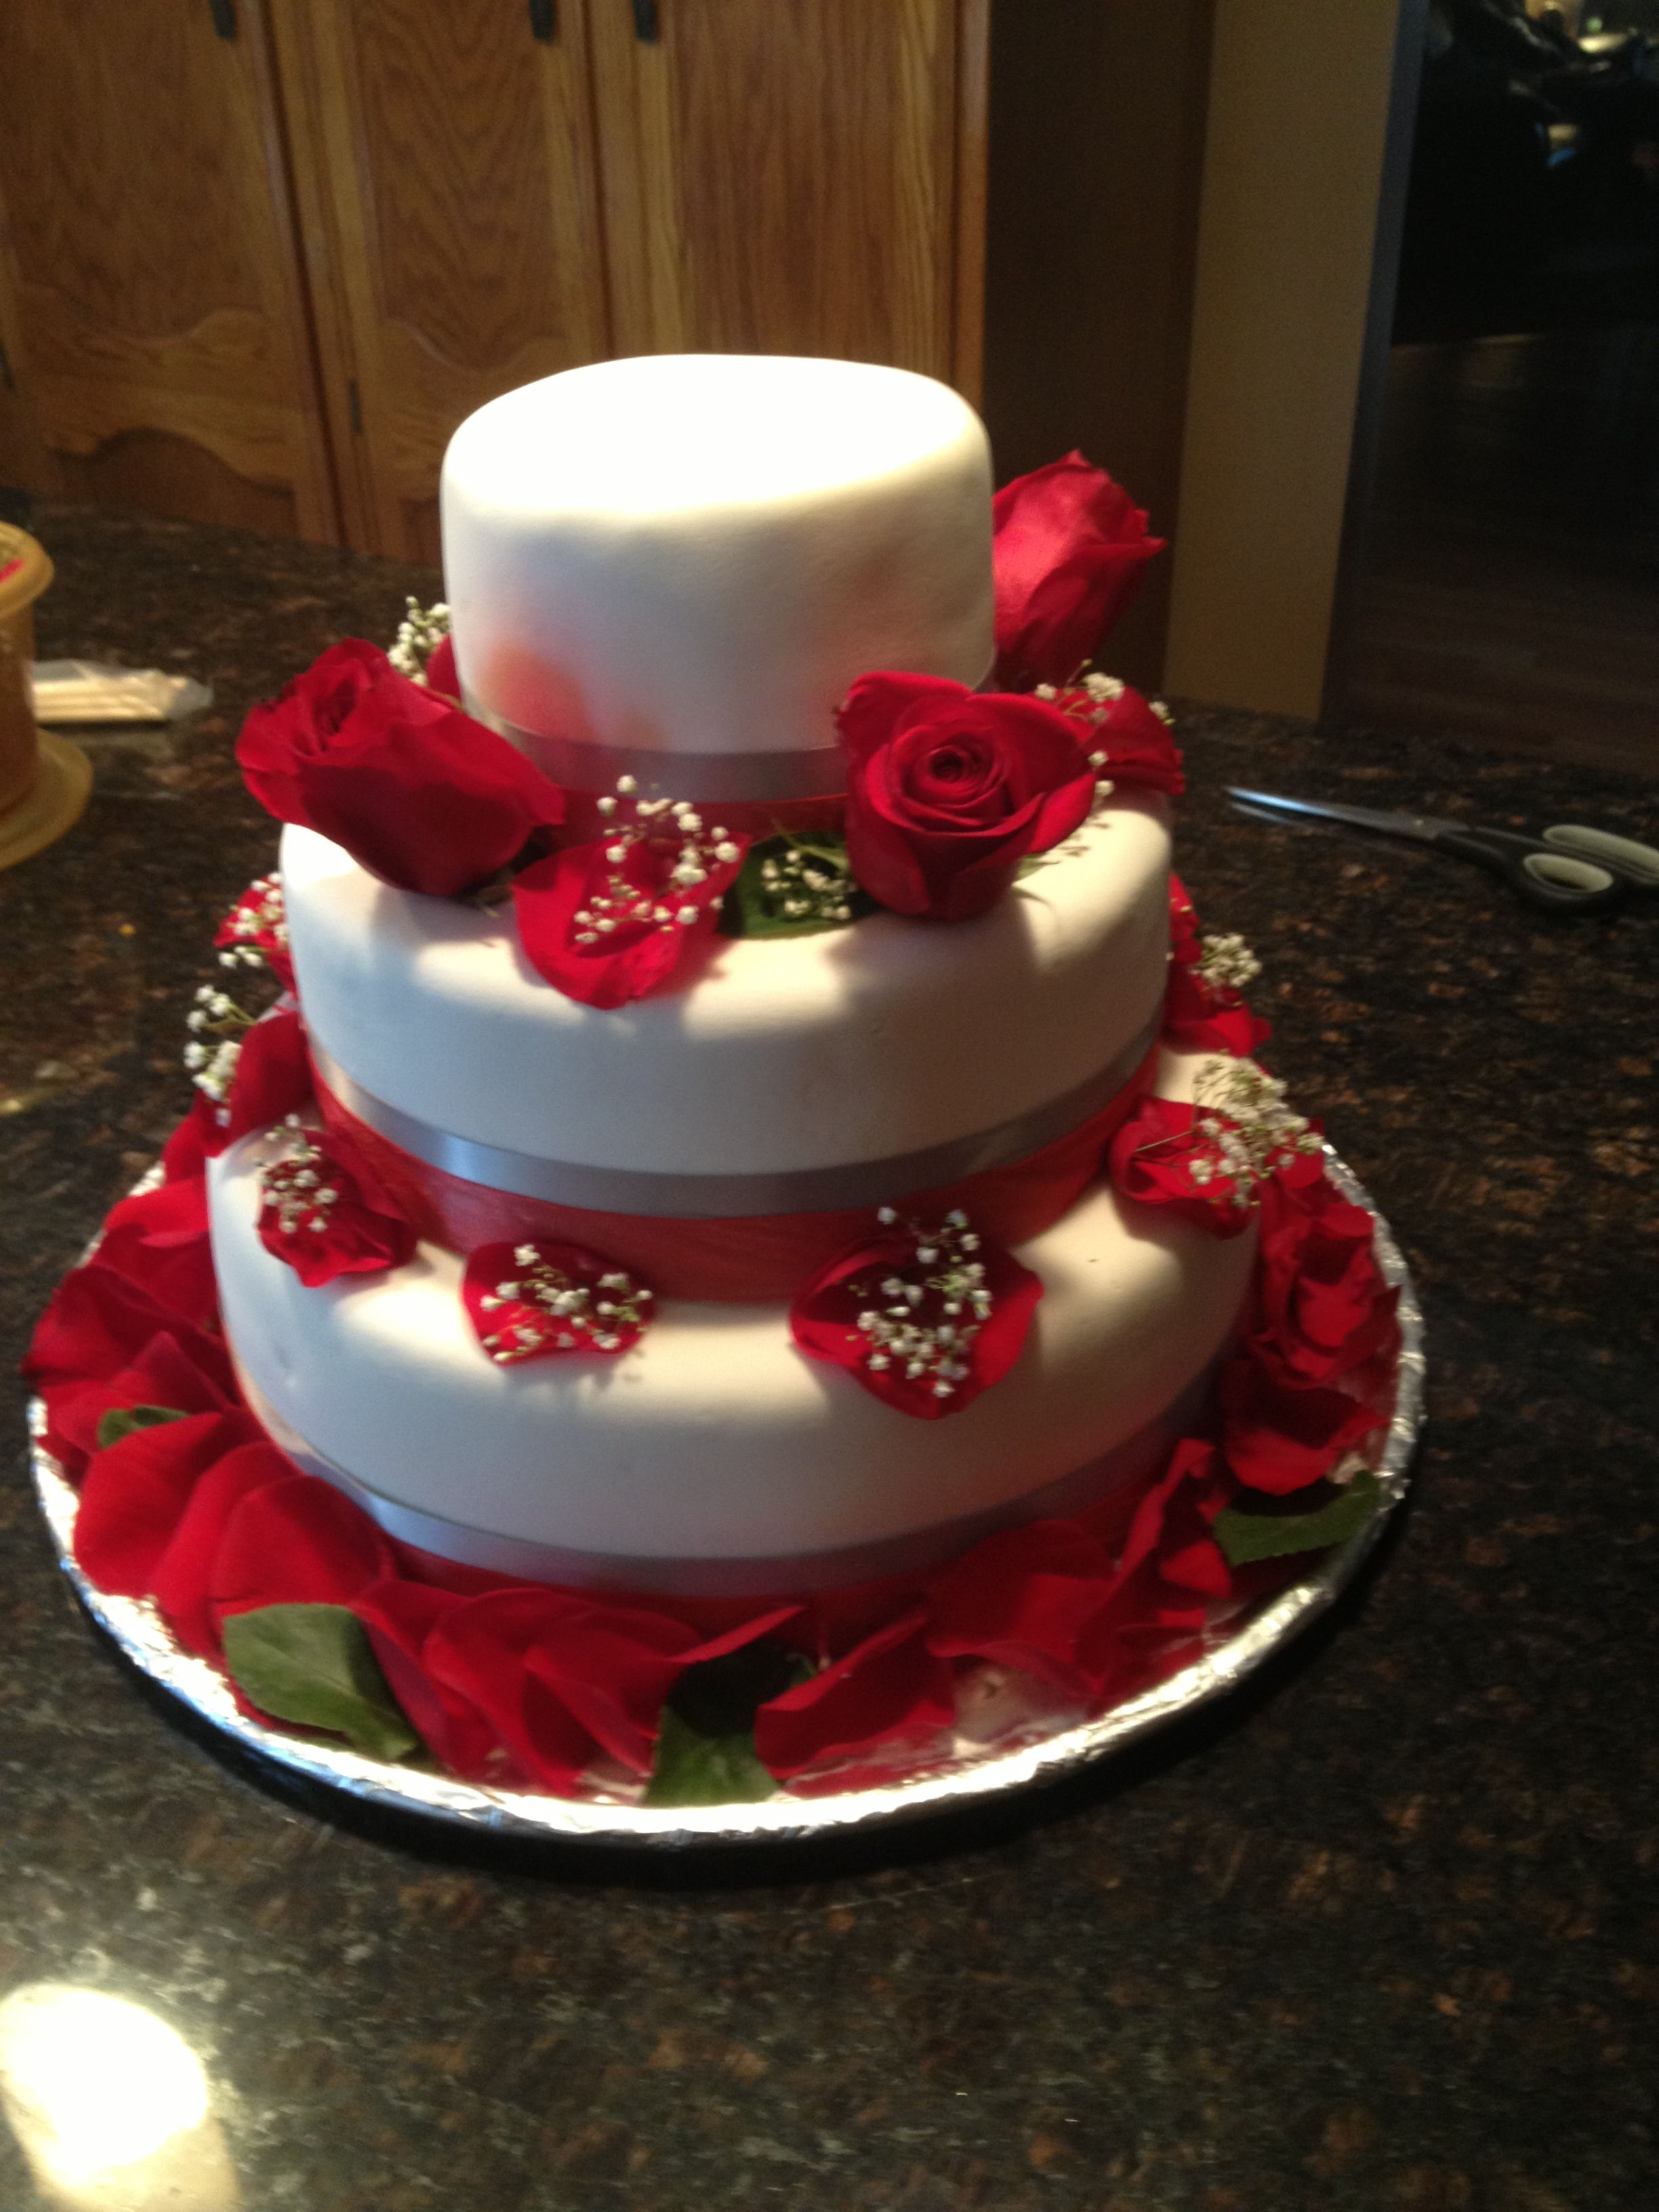 25th wedding anniversary christmas ornament - Made This For A 25th Wedding Anniversary My First Professional Cake White